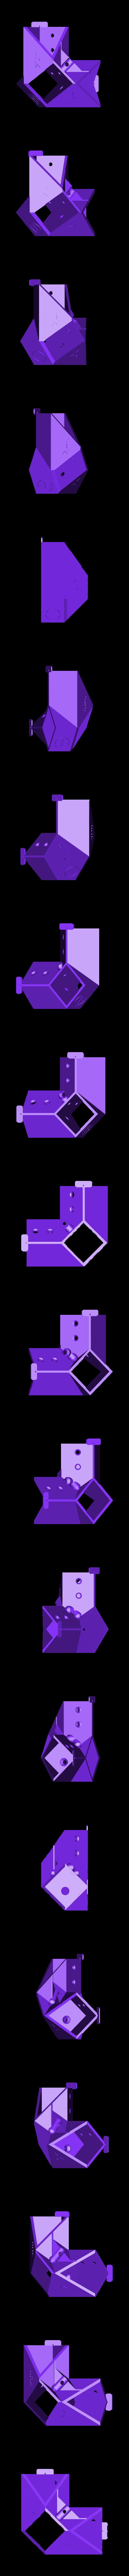 link_3_connectors_90.stl Download free STL file link • 3D print template, antoine_taillandier_studio